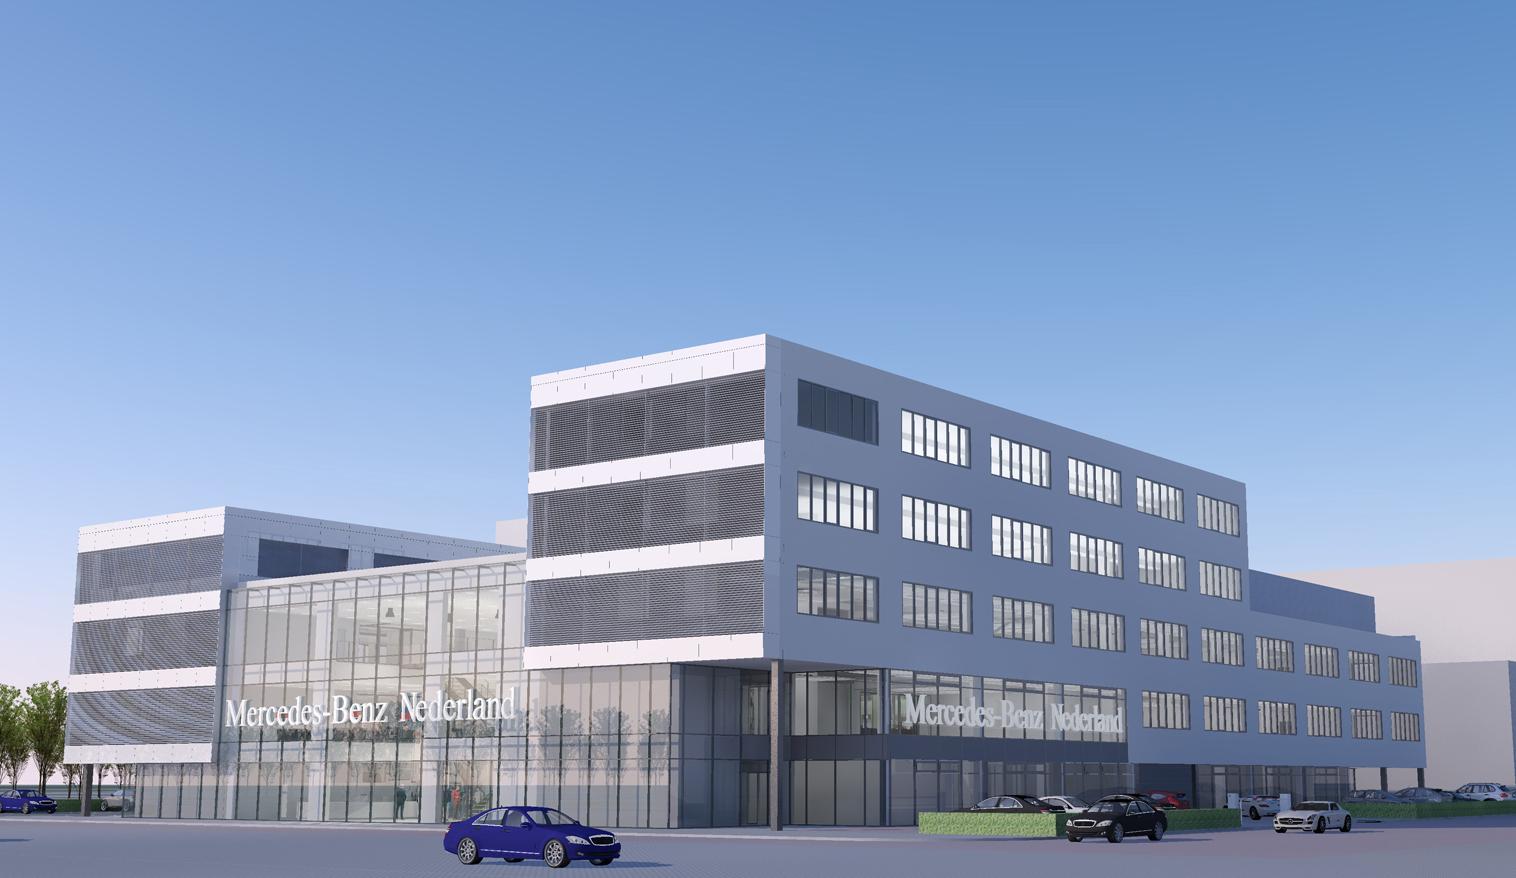 04 z OPL Architecten_Mercedes Benz HQ NL -1516×878-72dpi